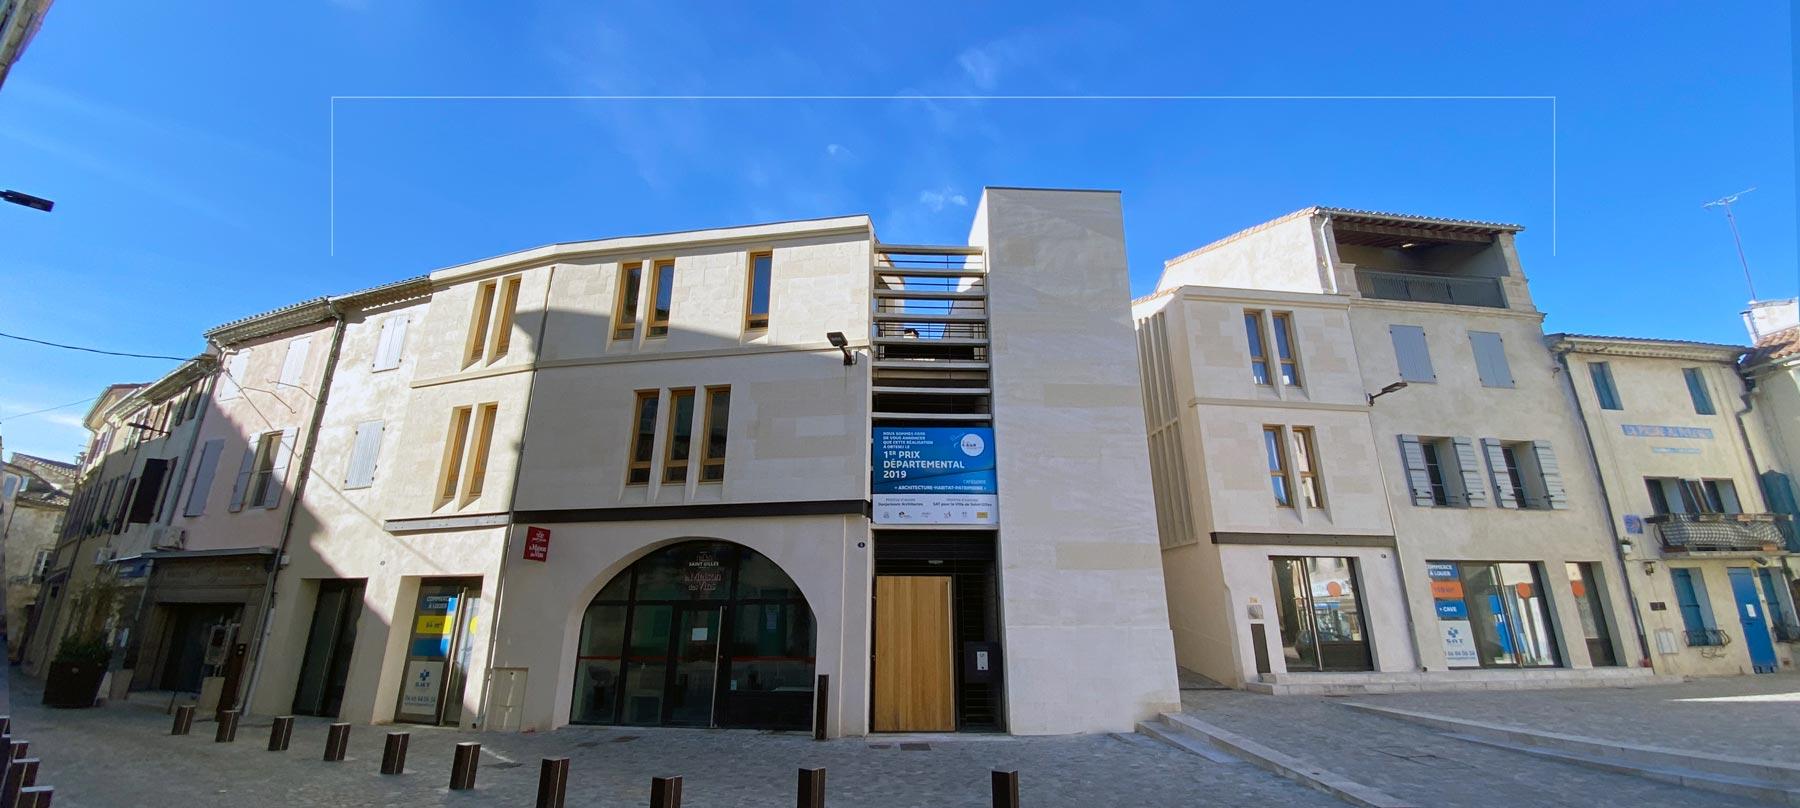 Malraux Gard Arles Nîmes